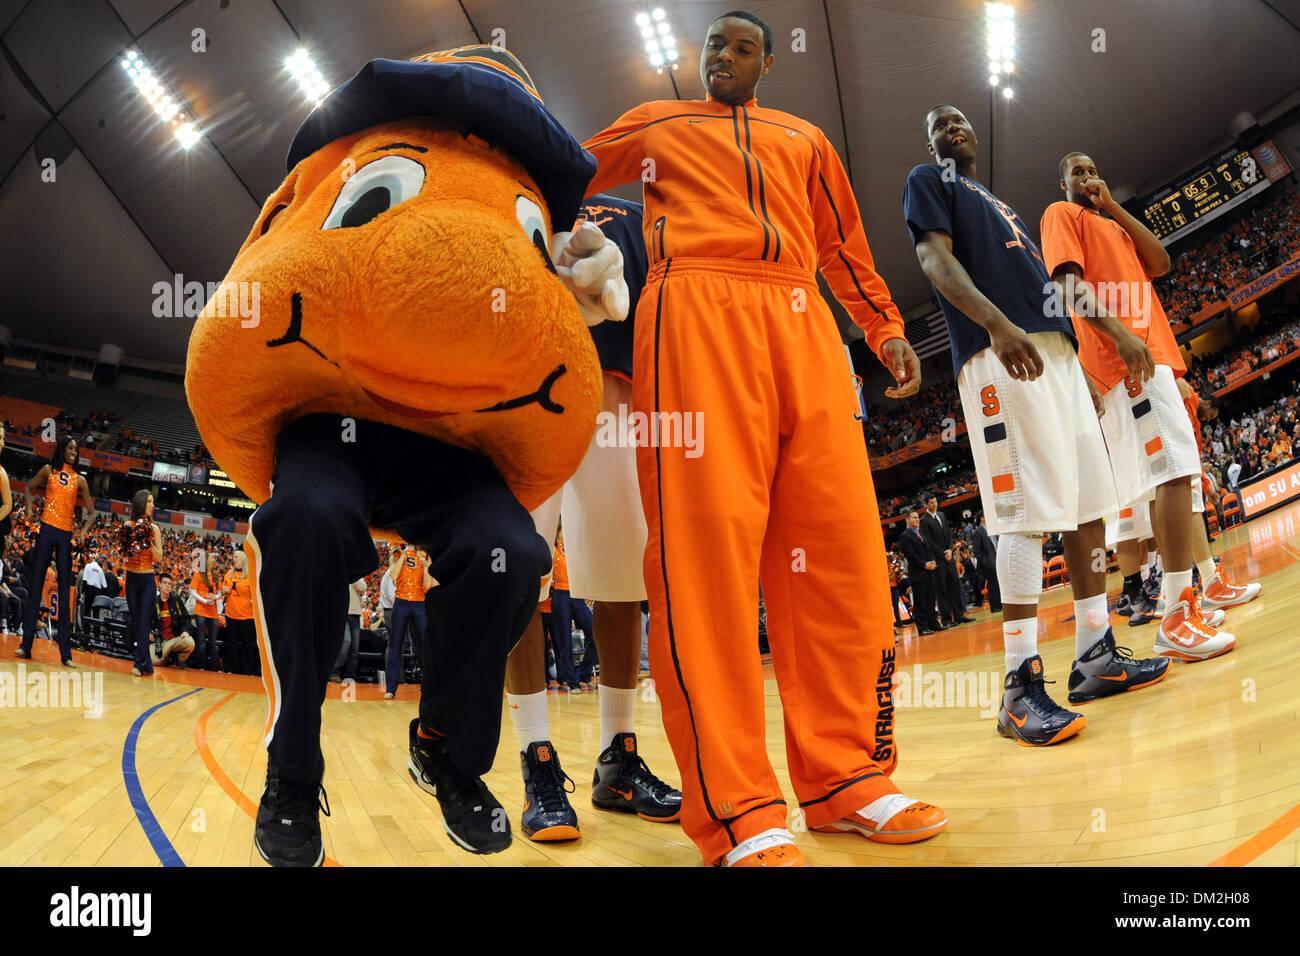 Syracuse Guard Scoop Jardine Middle Dribbles Orange Mascot Otto